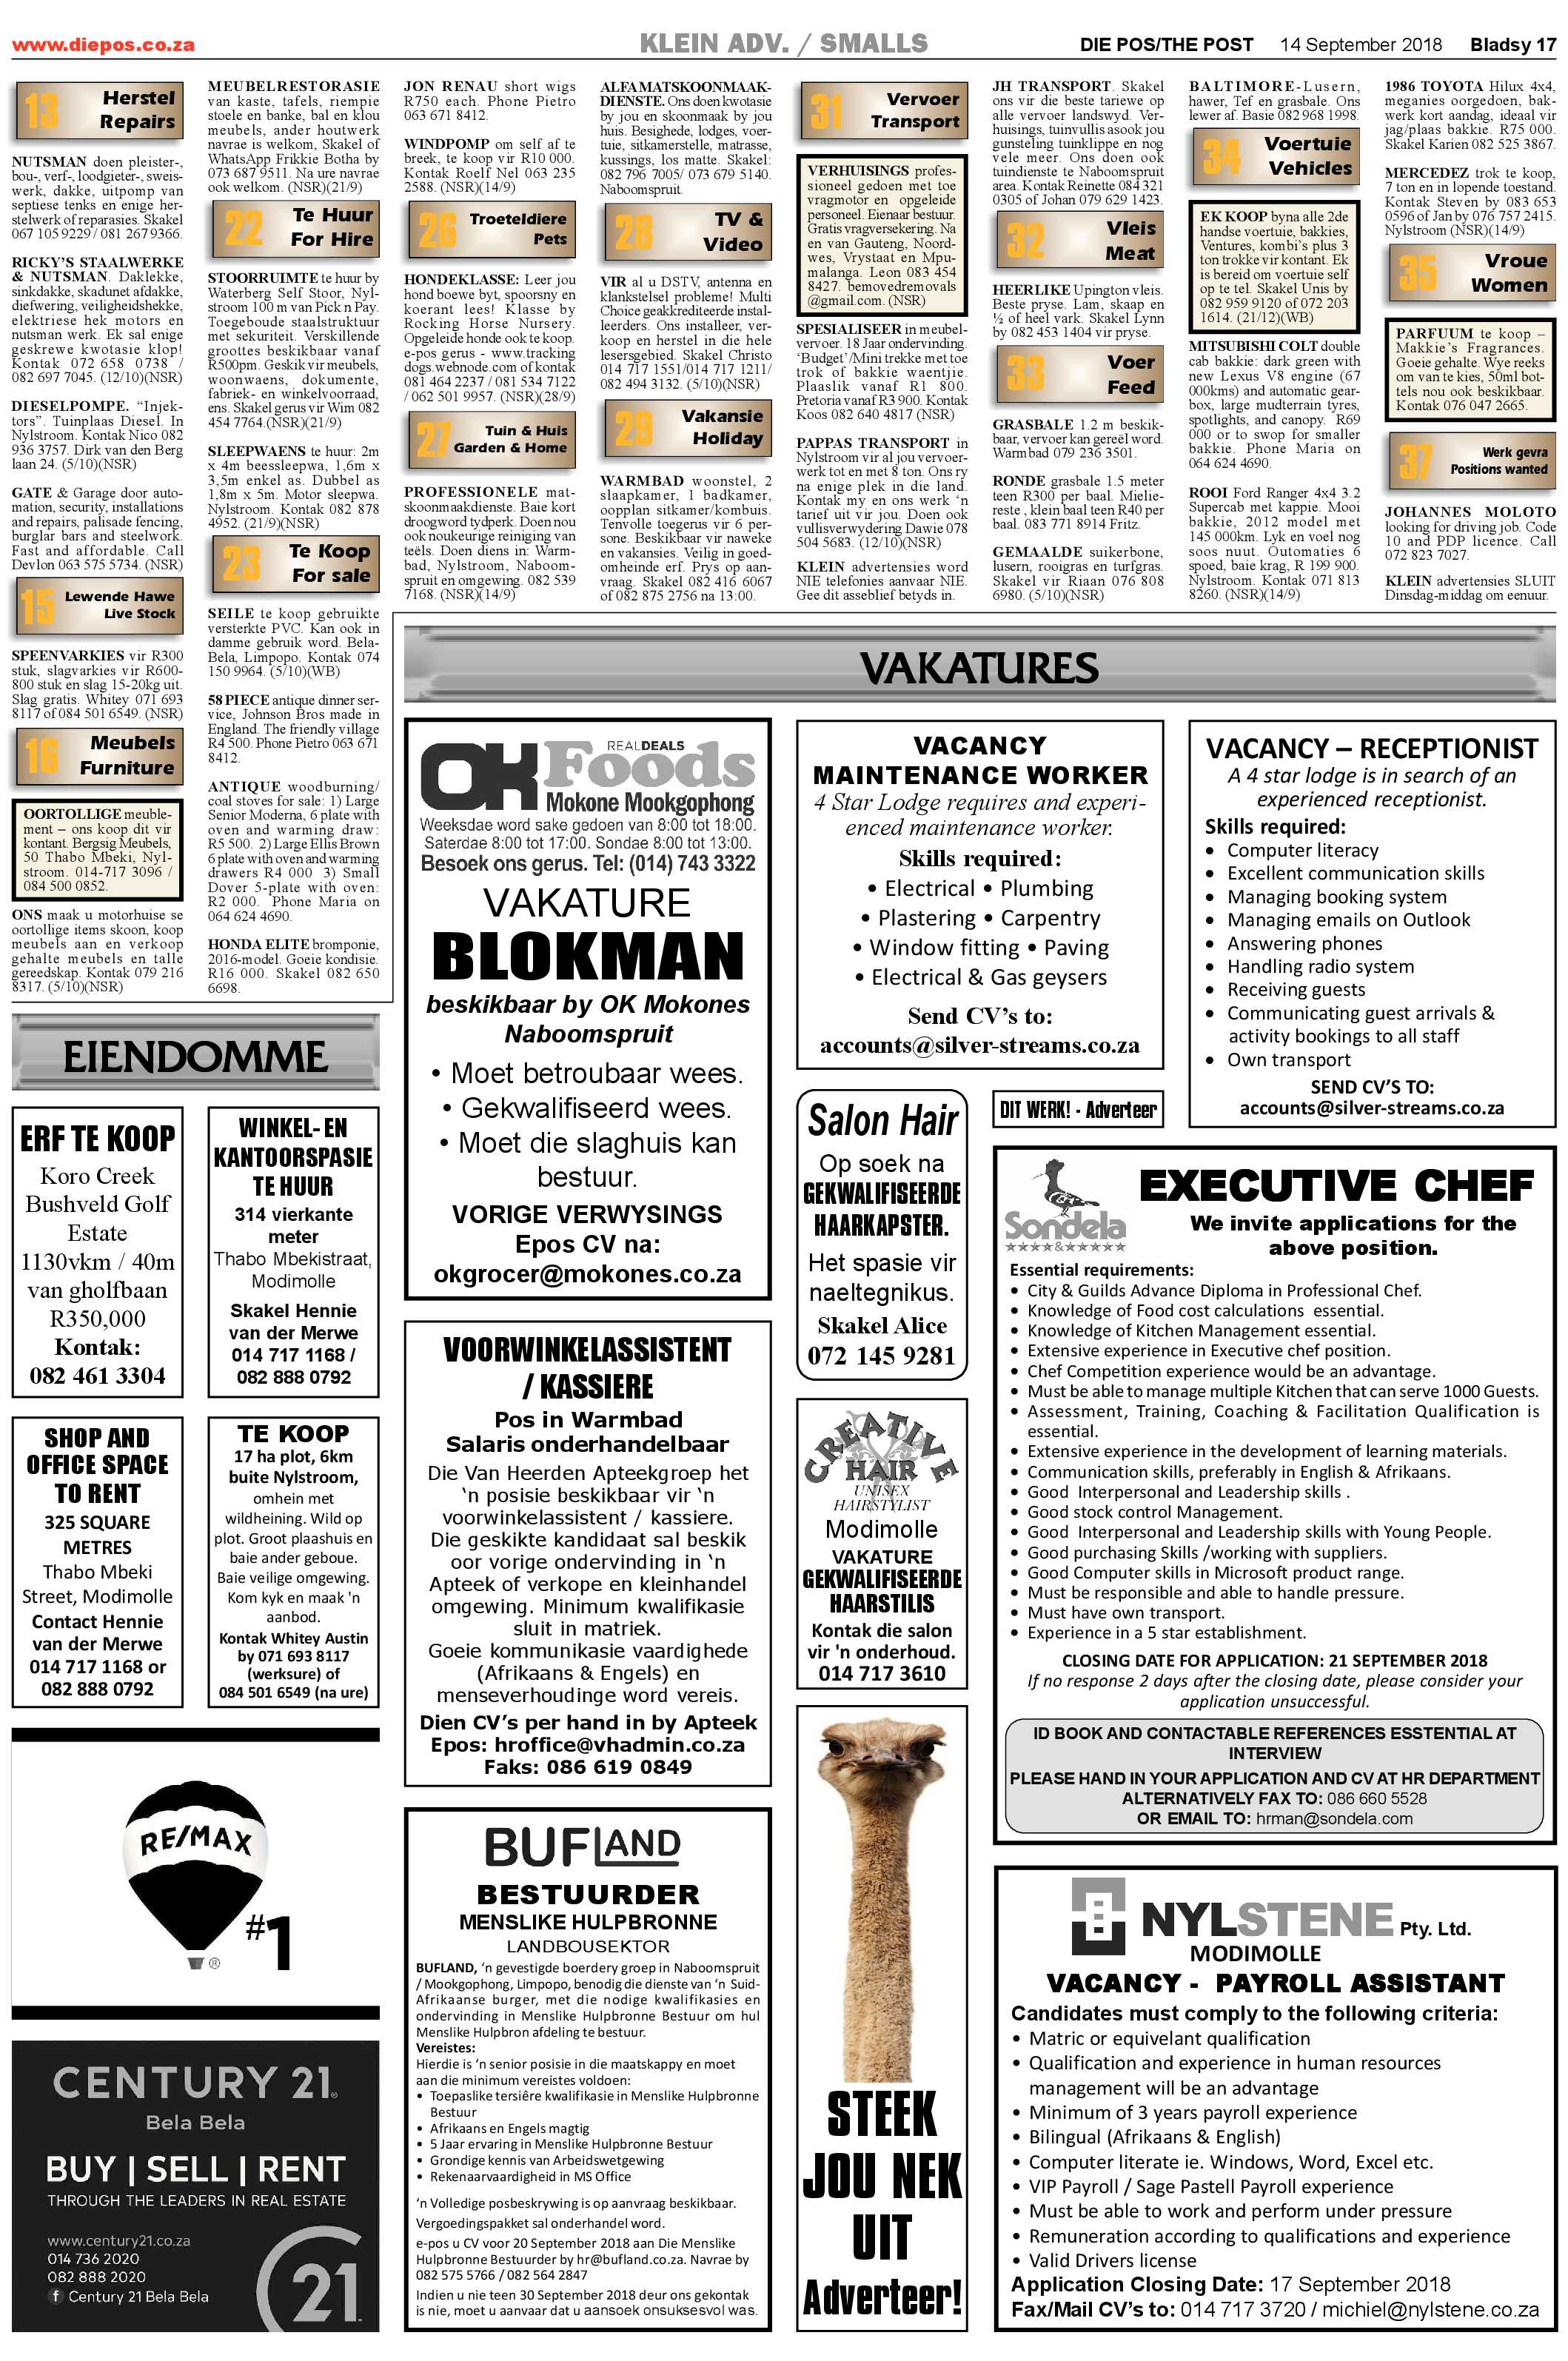 smalls-vacancies-14-september-2018-epapers-page-2